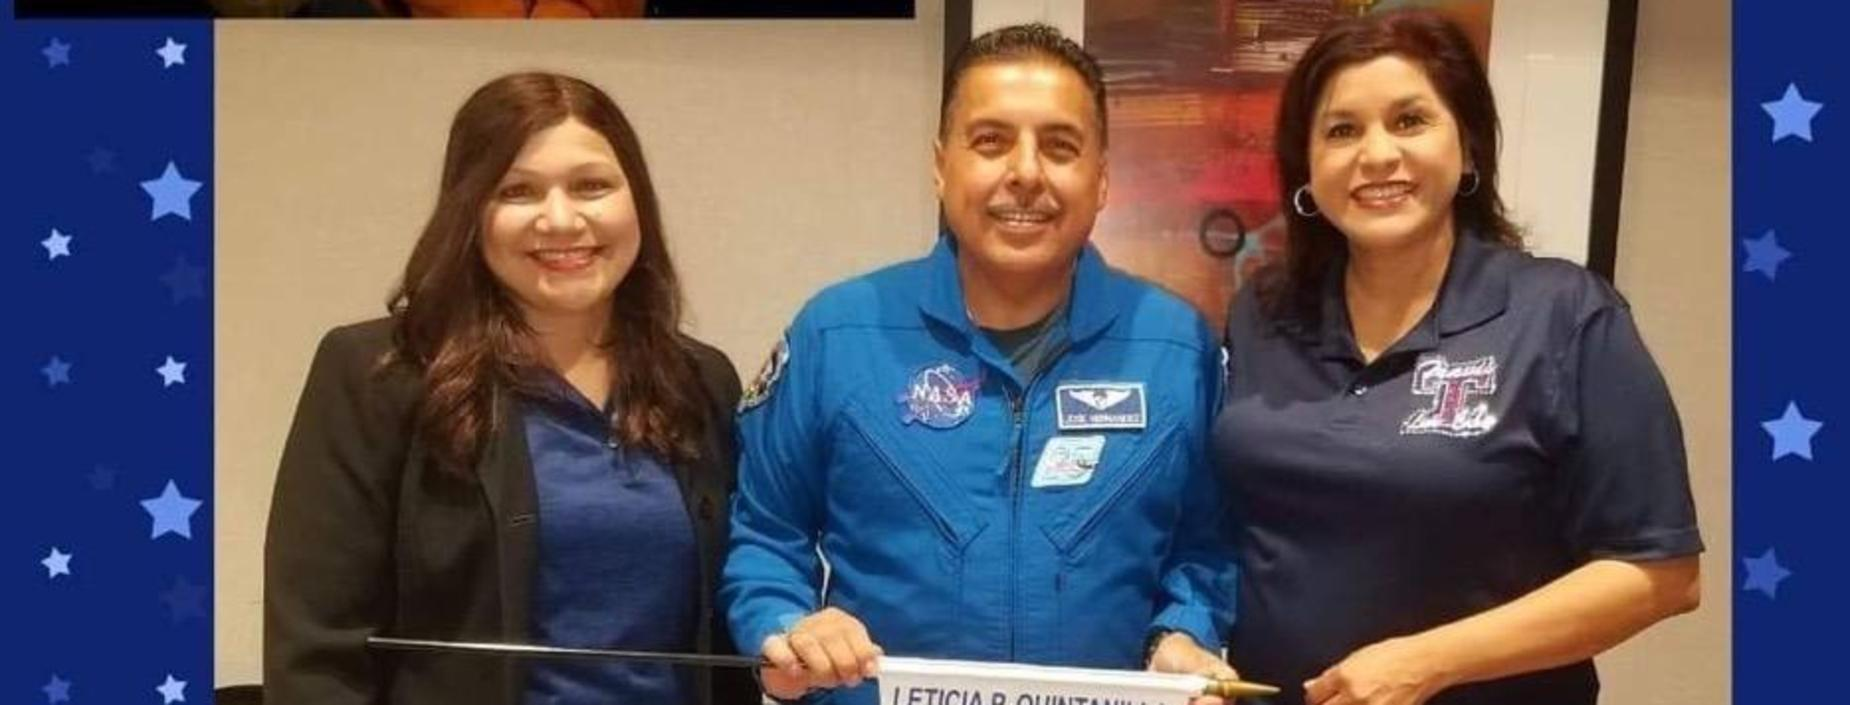 Keynote Speaker Former NASA Astronaut Jose M. Hernandez